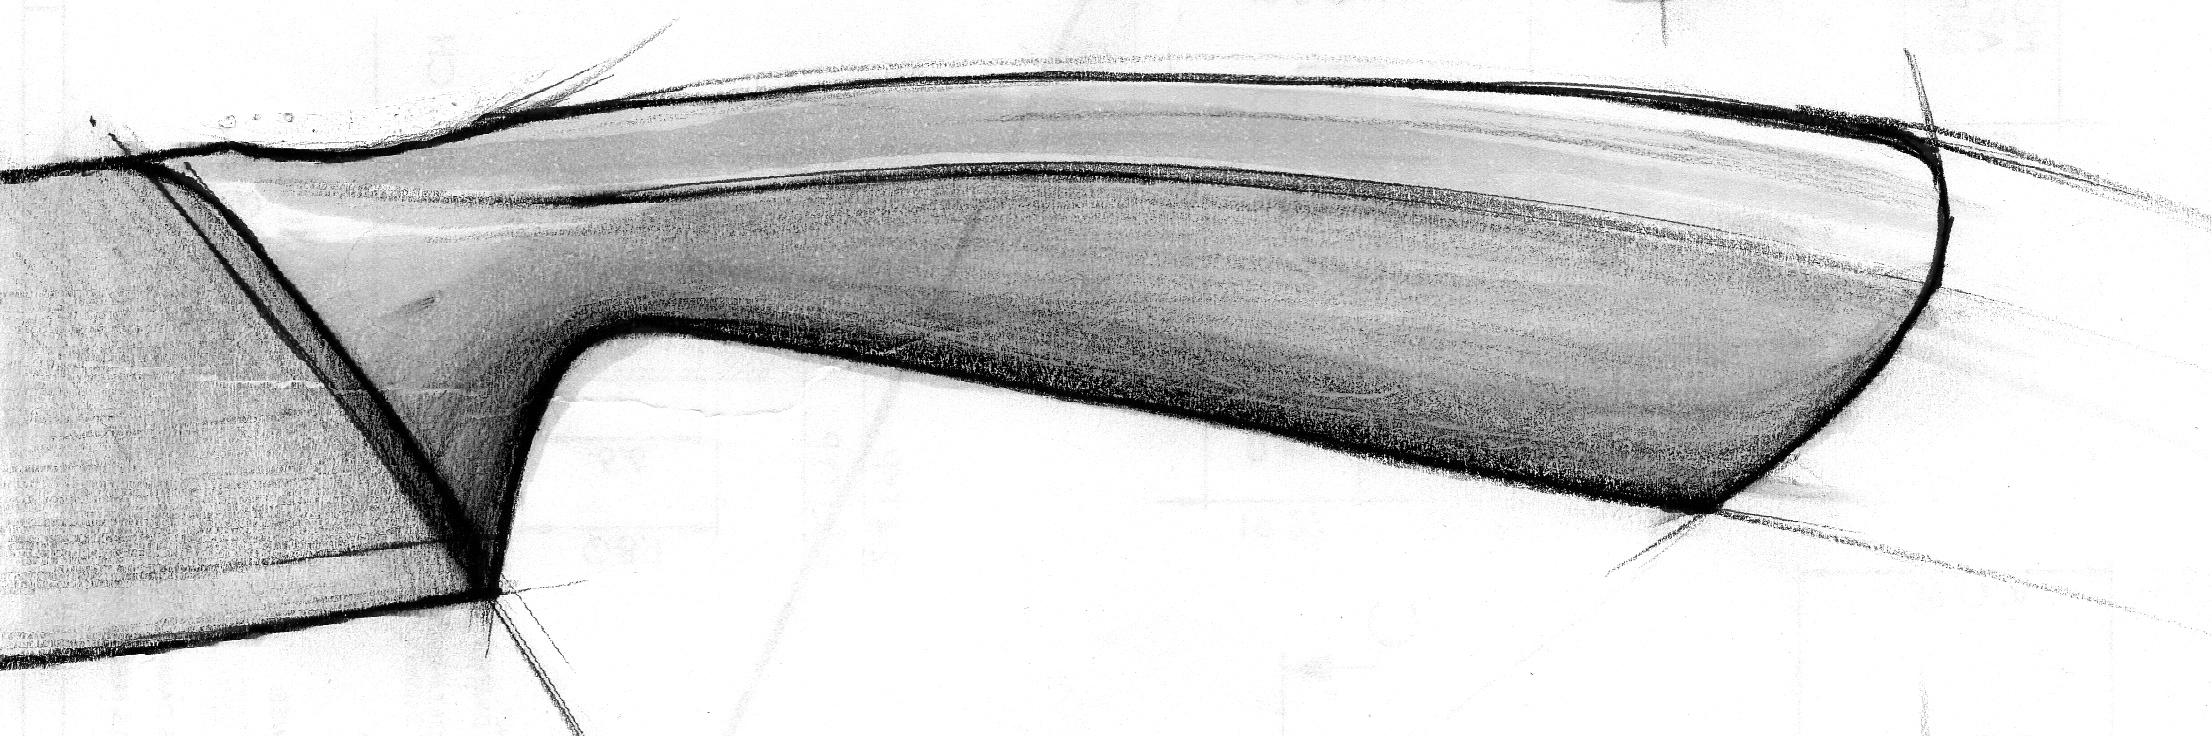 knife side profile.jpg